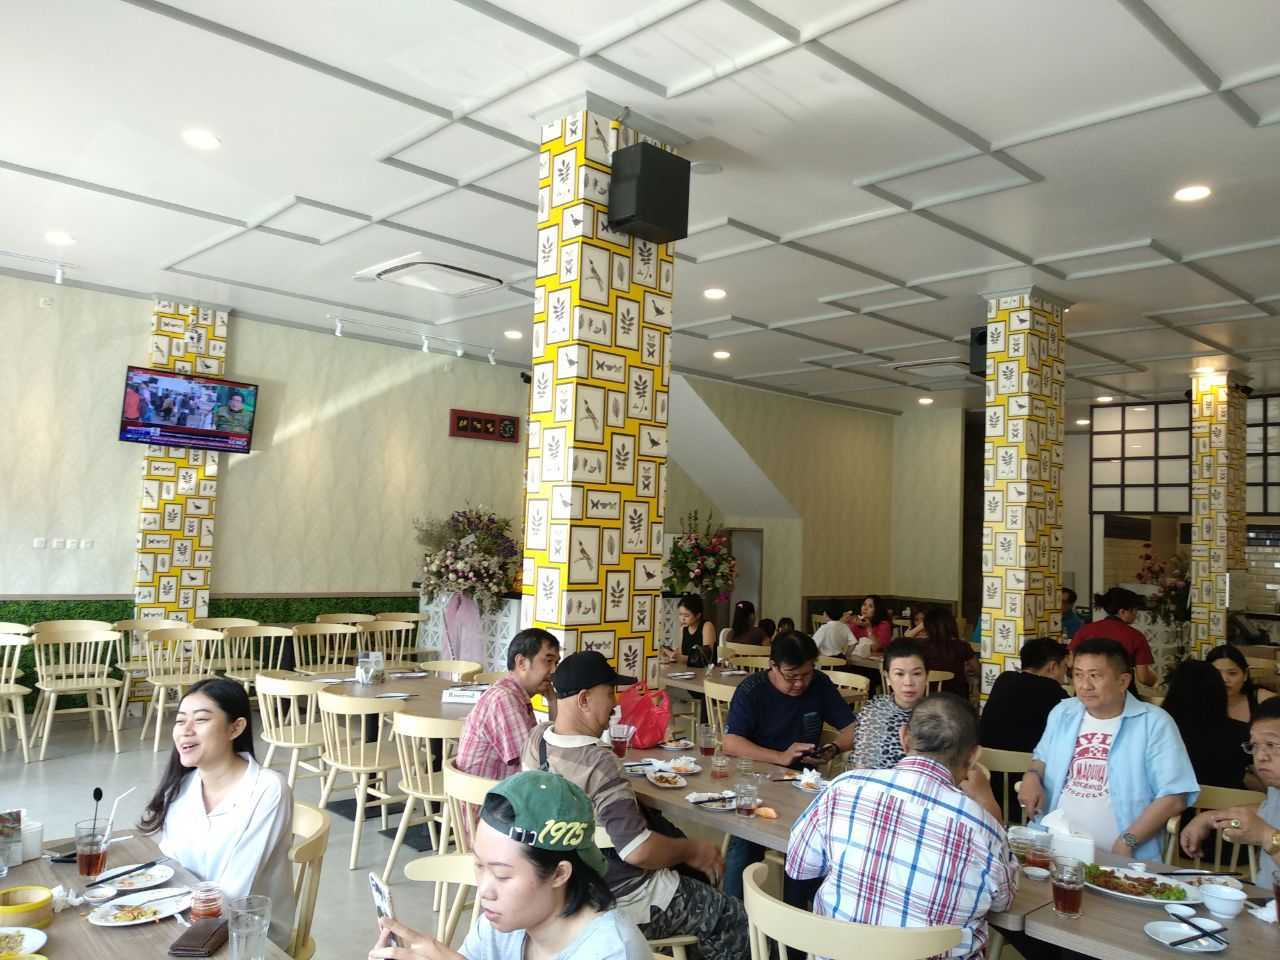 Mimic Concept Restaurant - Pluit Pluit, Penjaringan, Kota Jkt Utara, Daerah Khusus Ibukota Jakarta, Indonesia Pluit, Penjaringan, Kota Jkt Utara, Daerah Khusus Ibukota Jakarta, Indonesia Dining Room (F&b)  55616